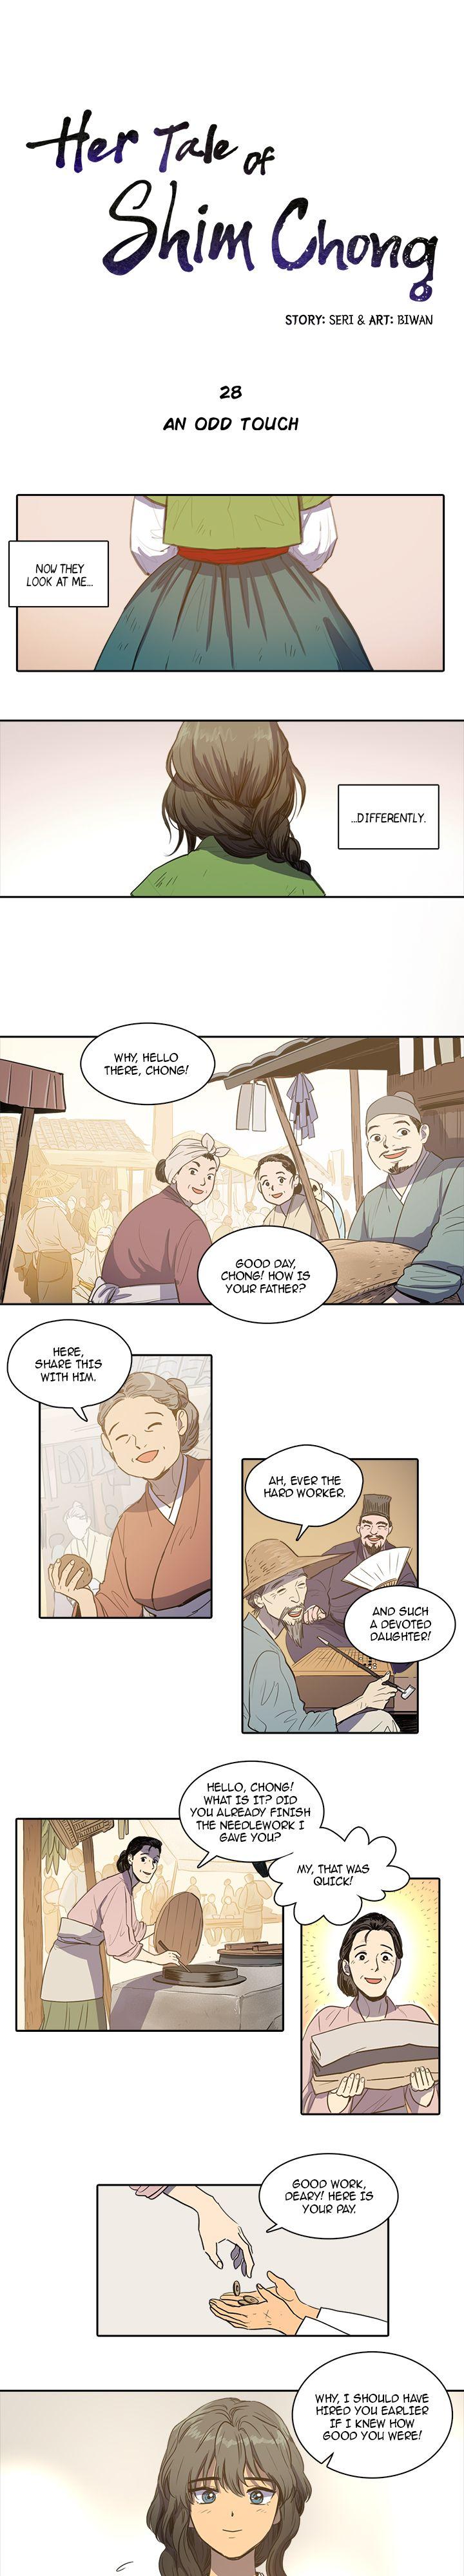 https://img2.nineanime.com/comics/pic2/58/27130/770798/3fd149edeb6af7e26837c50aea1560c5.jpg Page 1